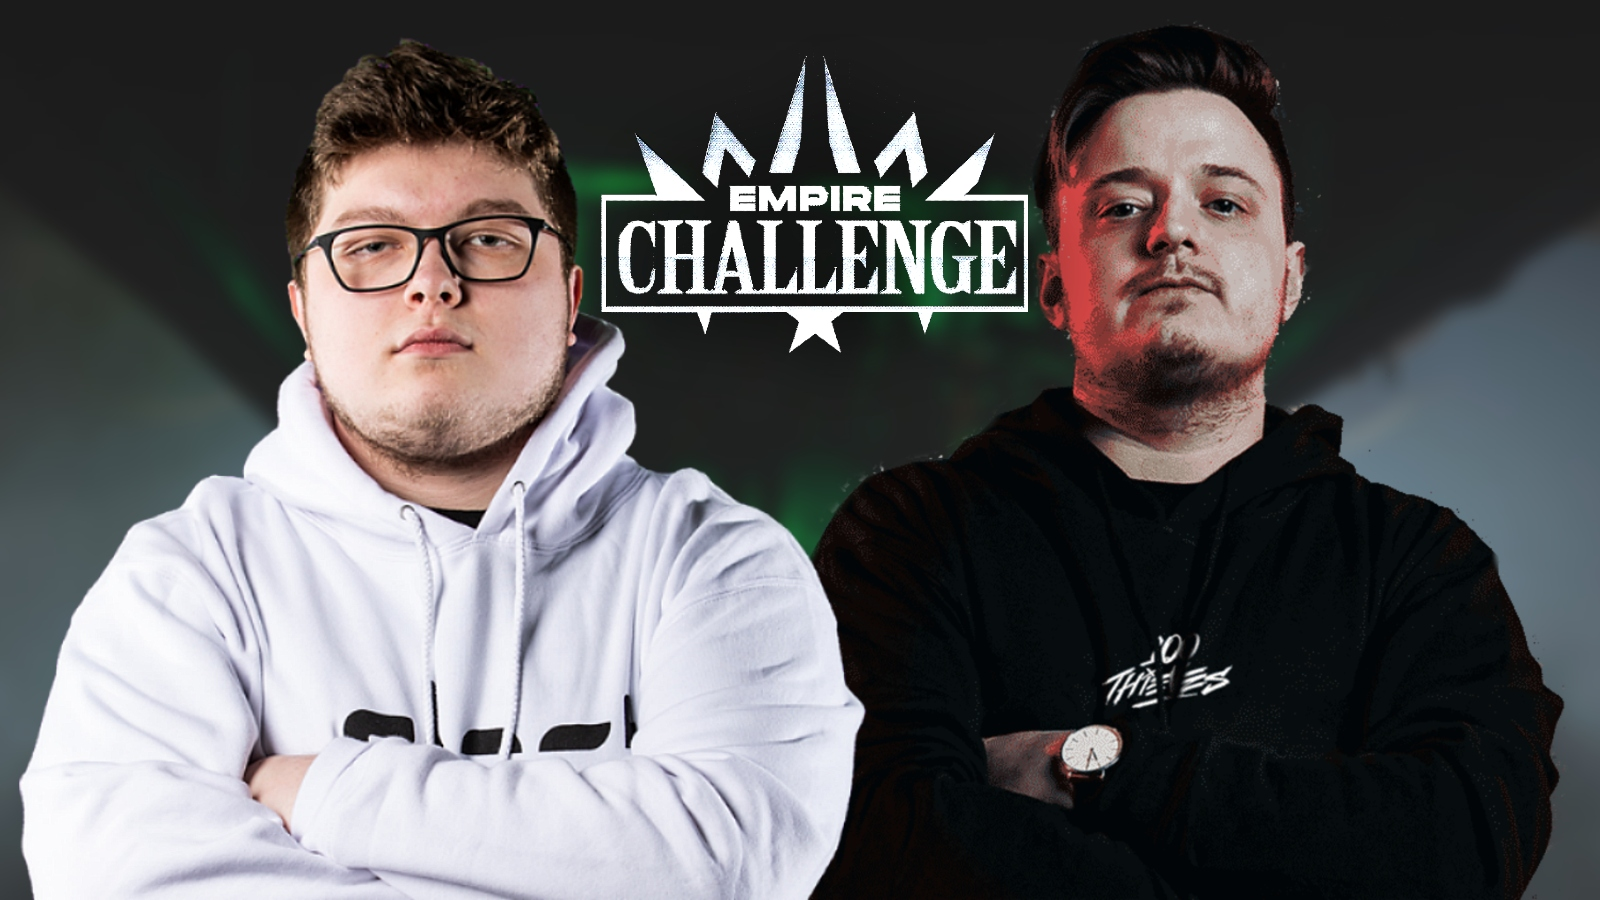 dallas empire warzone challenge tournament tommey aydan